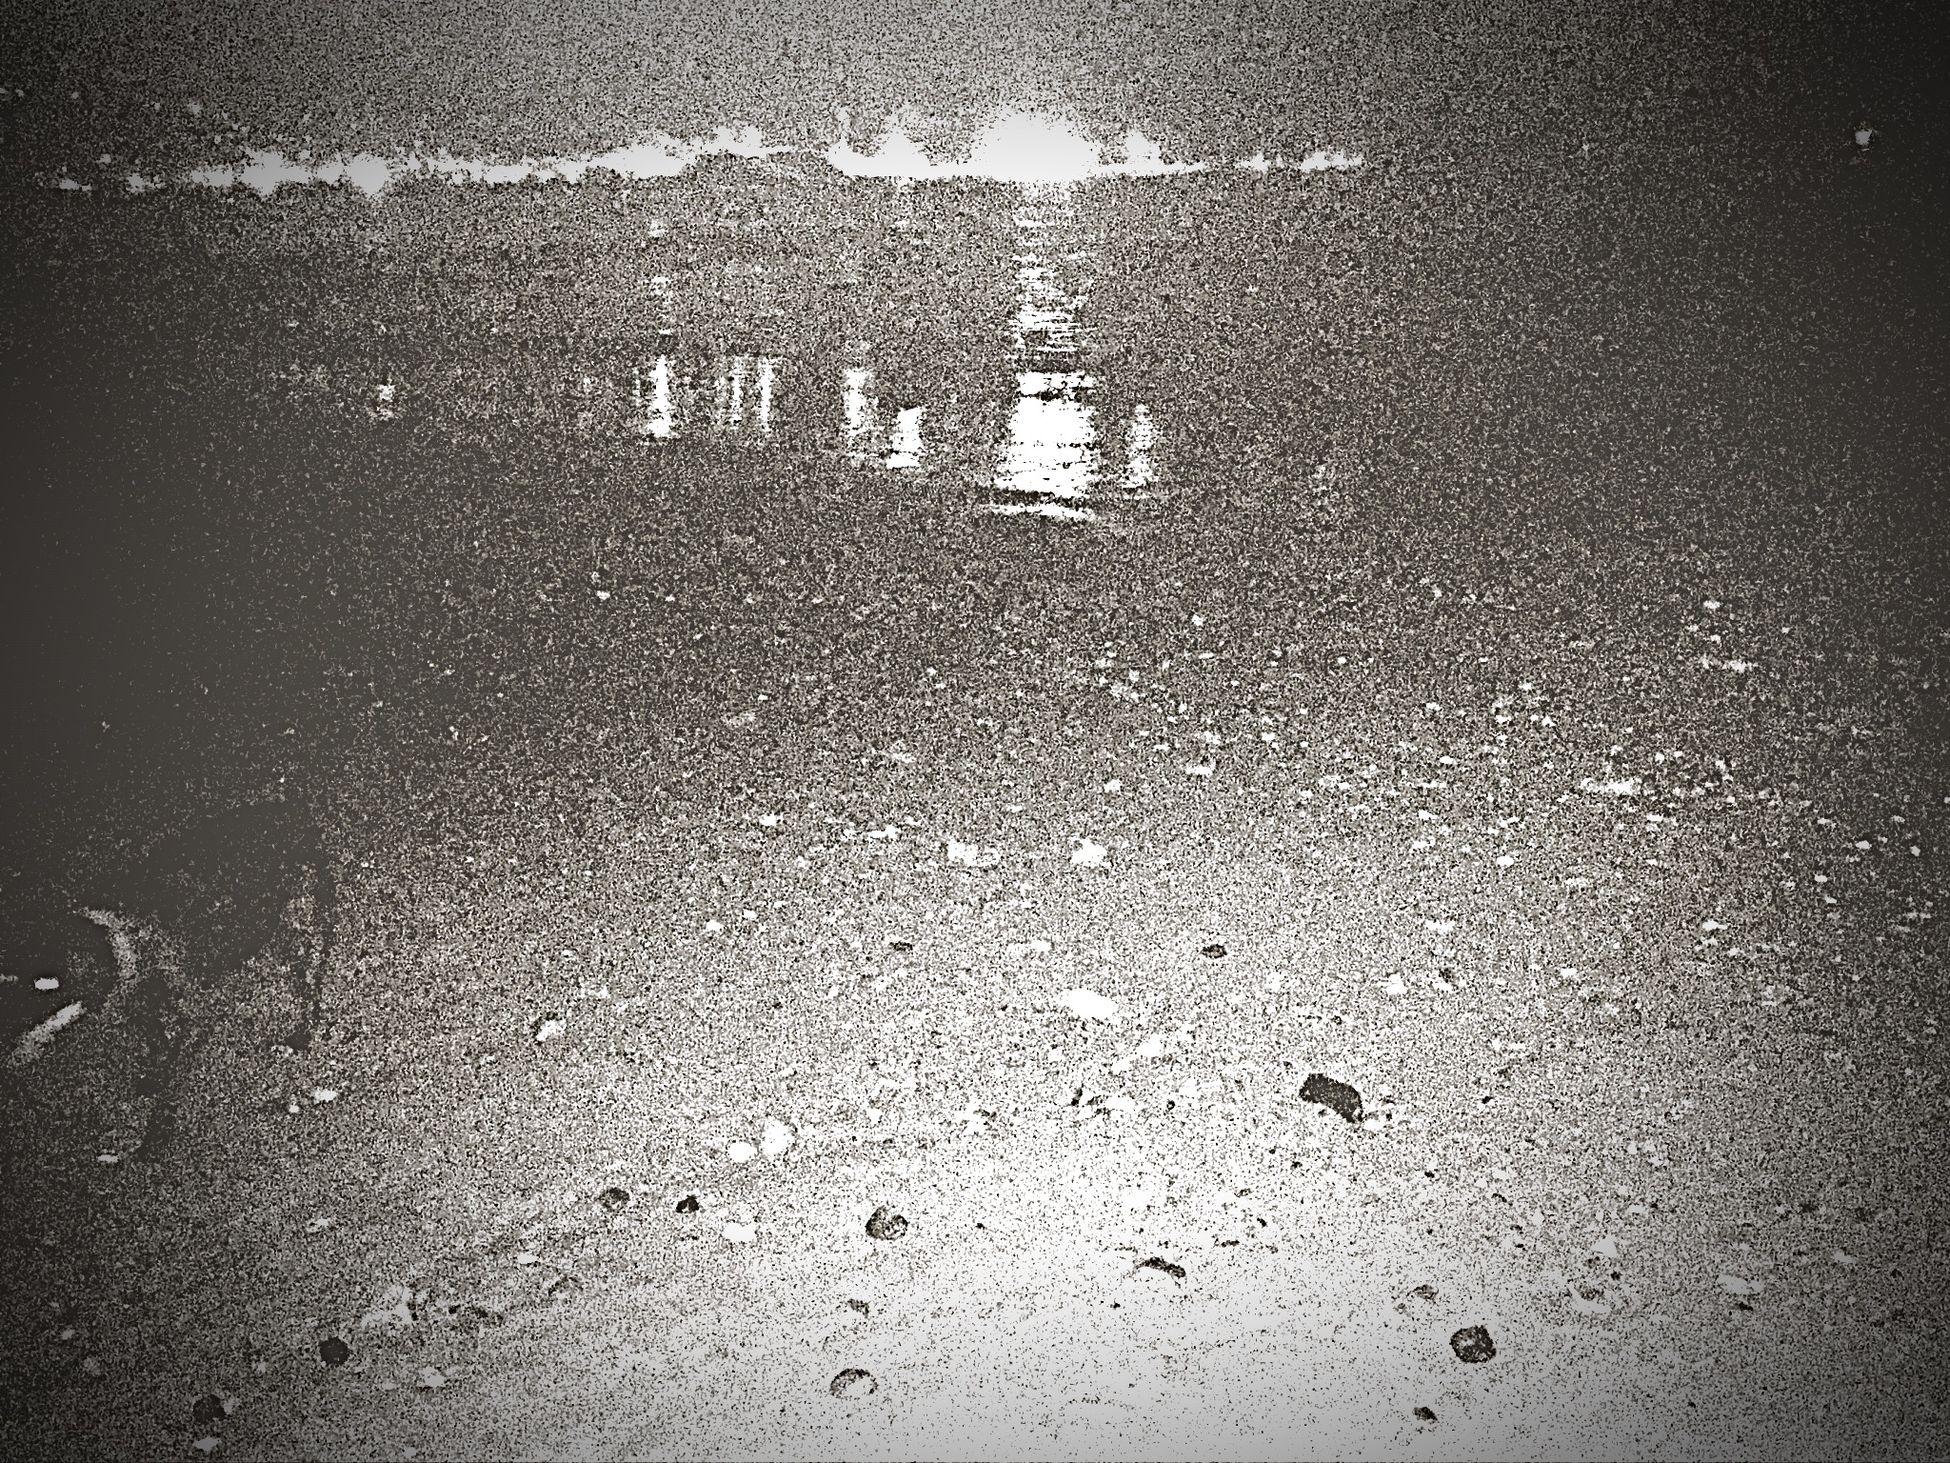 CantSeeMuchInTheDark Bit Of My City Burnie 4:30am DoggieWalkAlongTheBeach